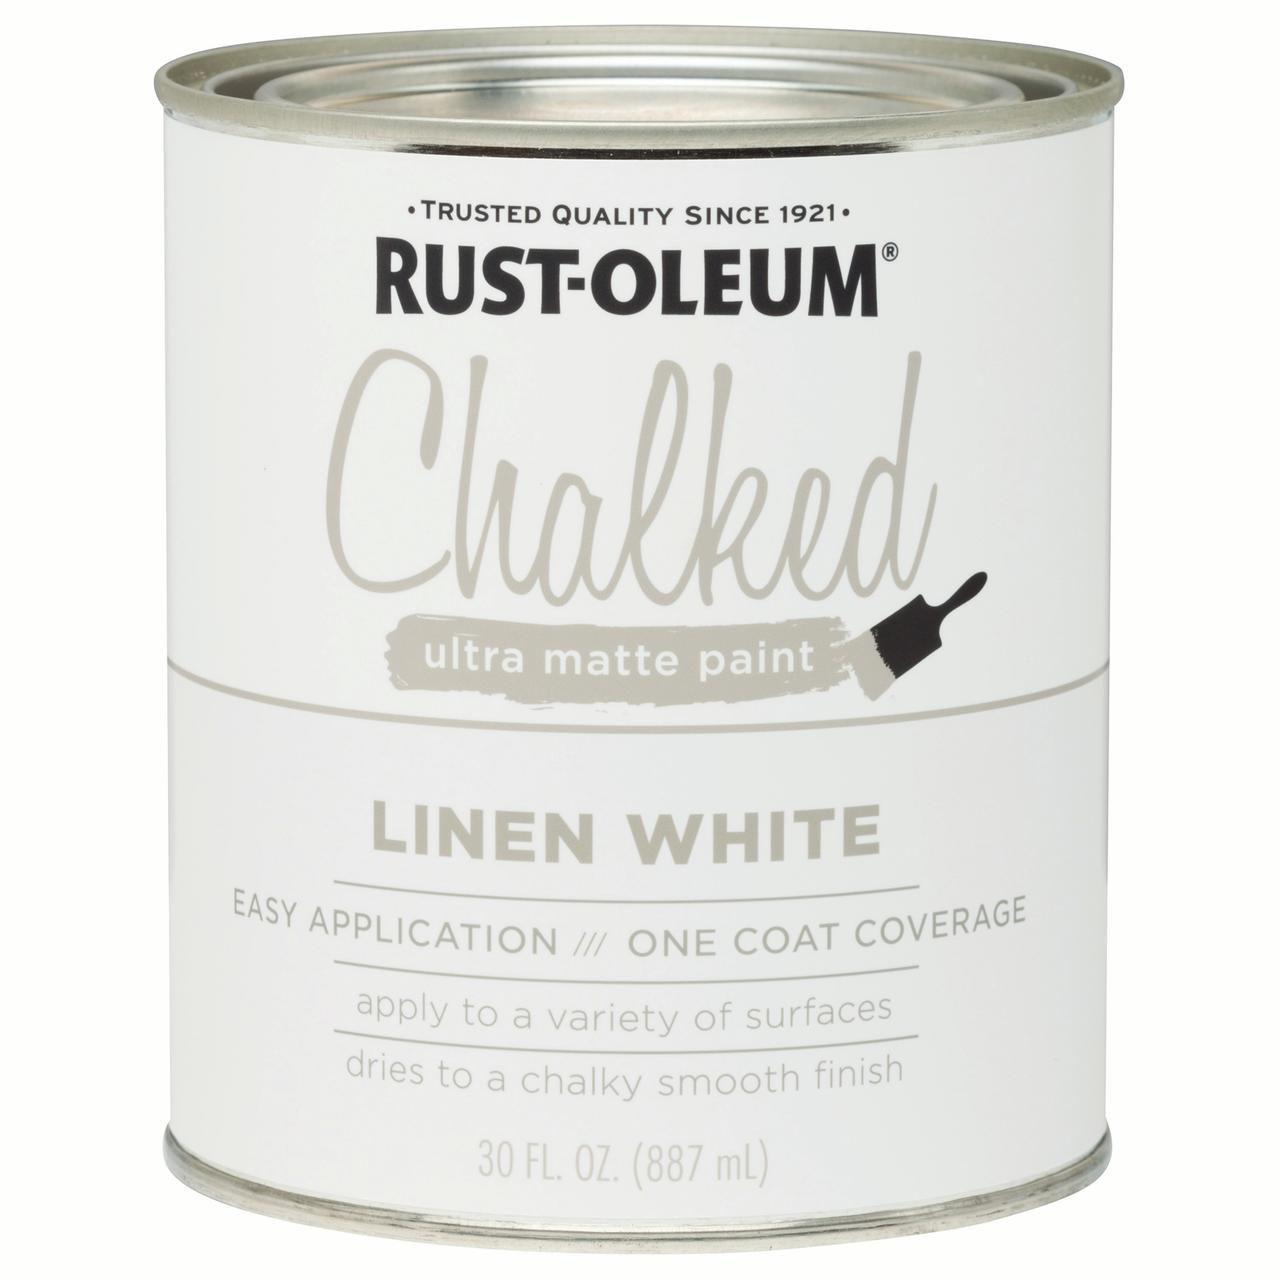 Chalked Ultra Matte Paint